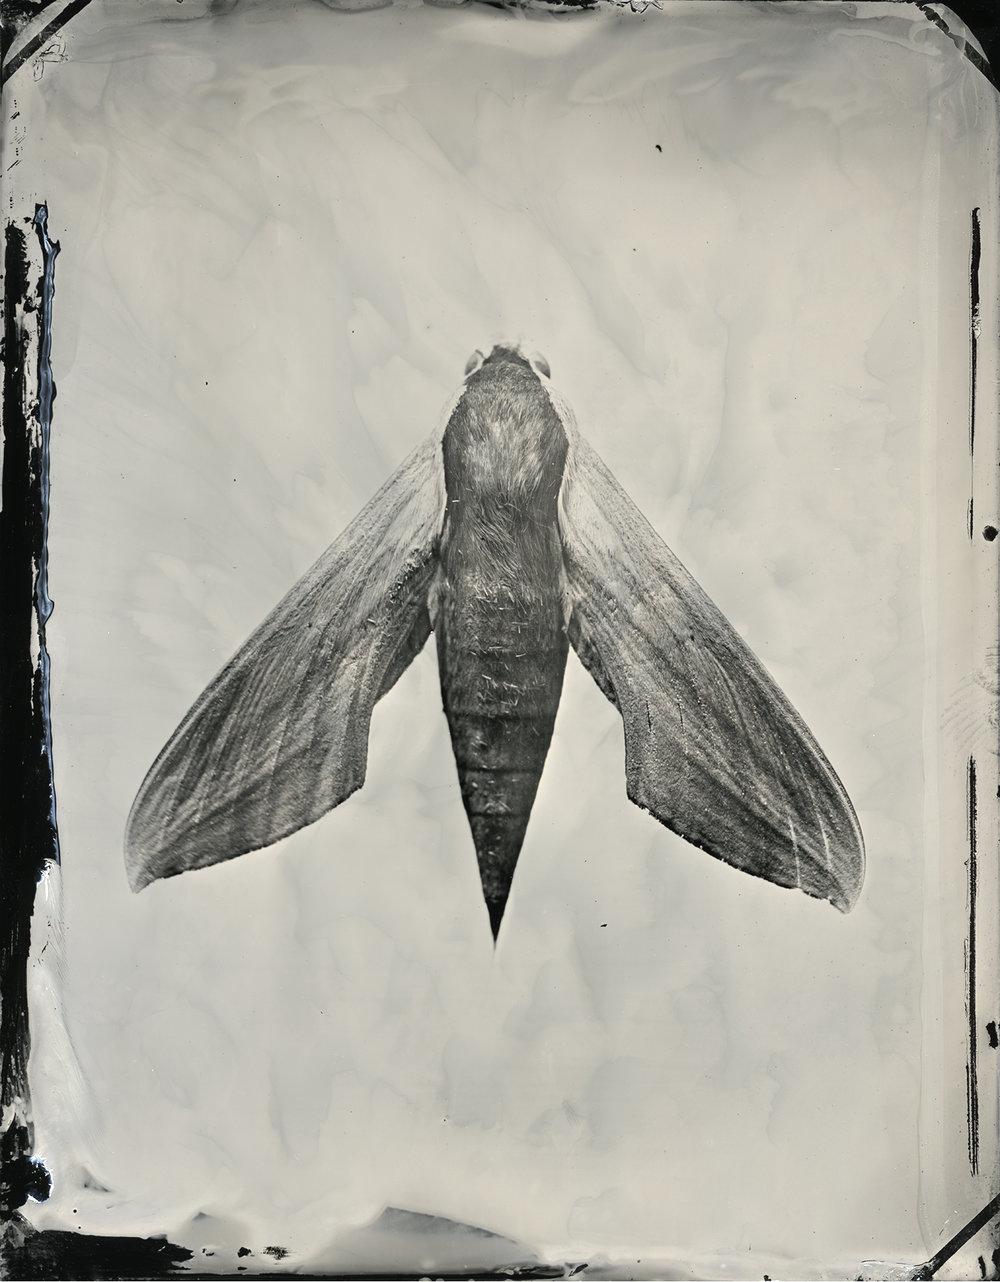 moth_prime_final_24x30_print_sec.jpg